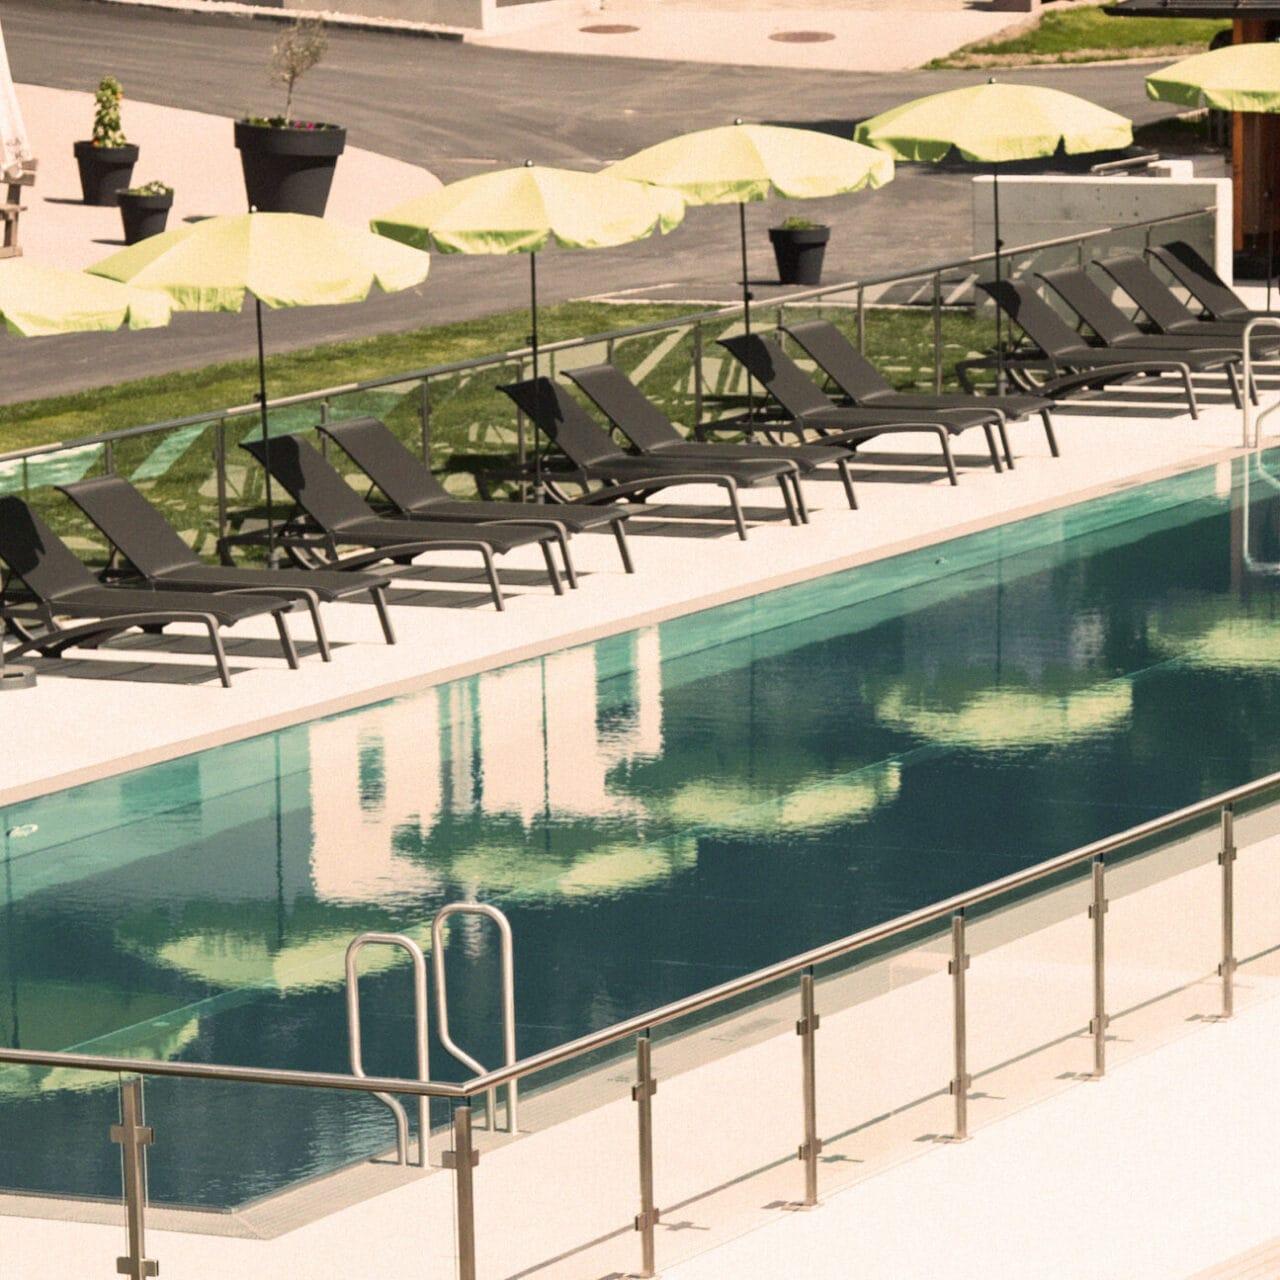 Hofgut-Apartment-lifestyle-resort-in-und-outdoorpool-sportbecken-totale